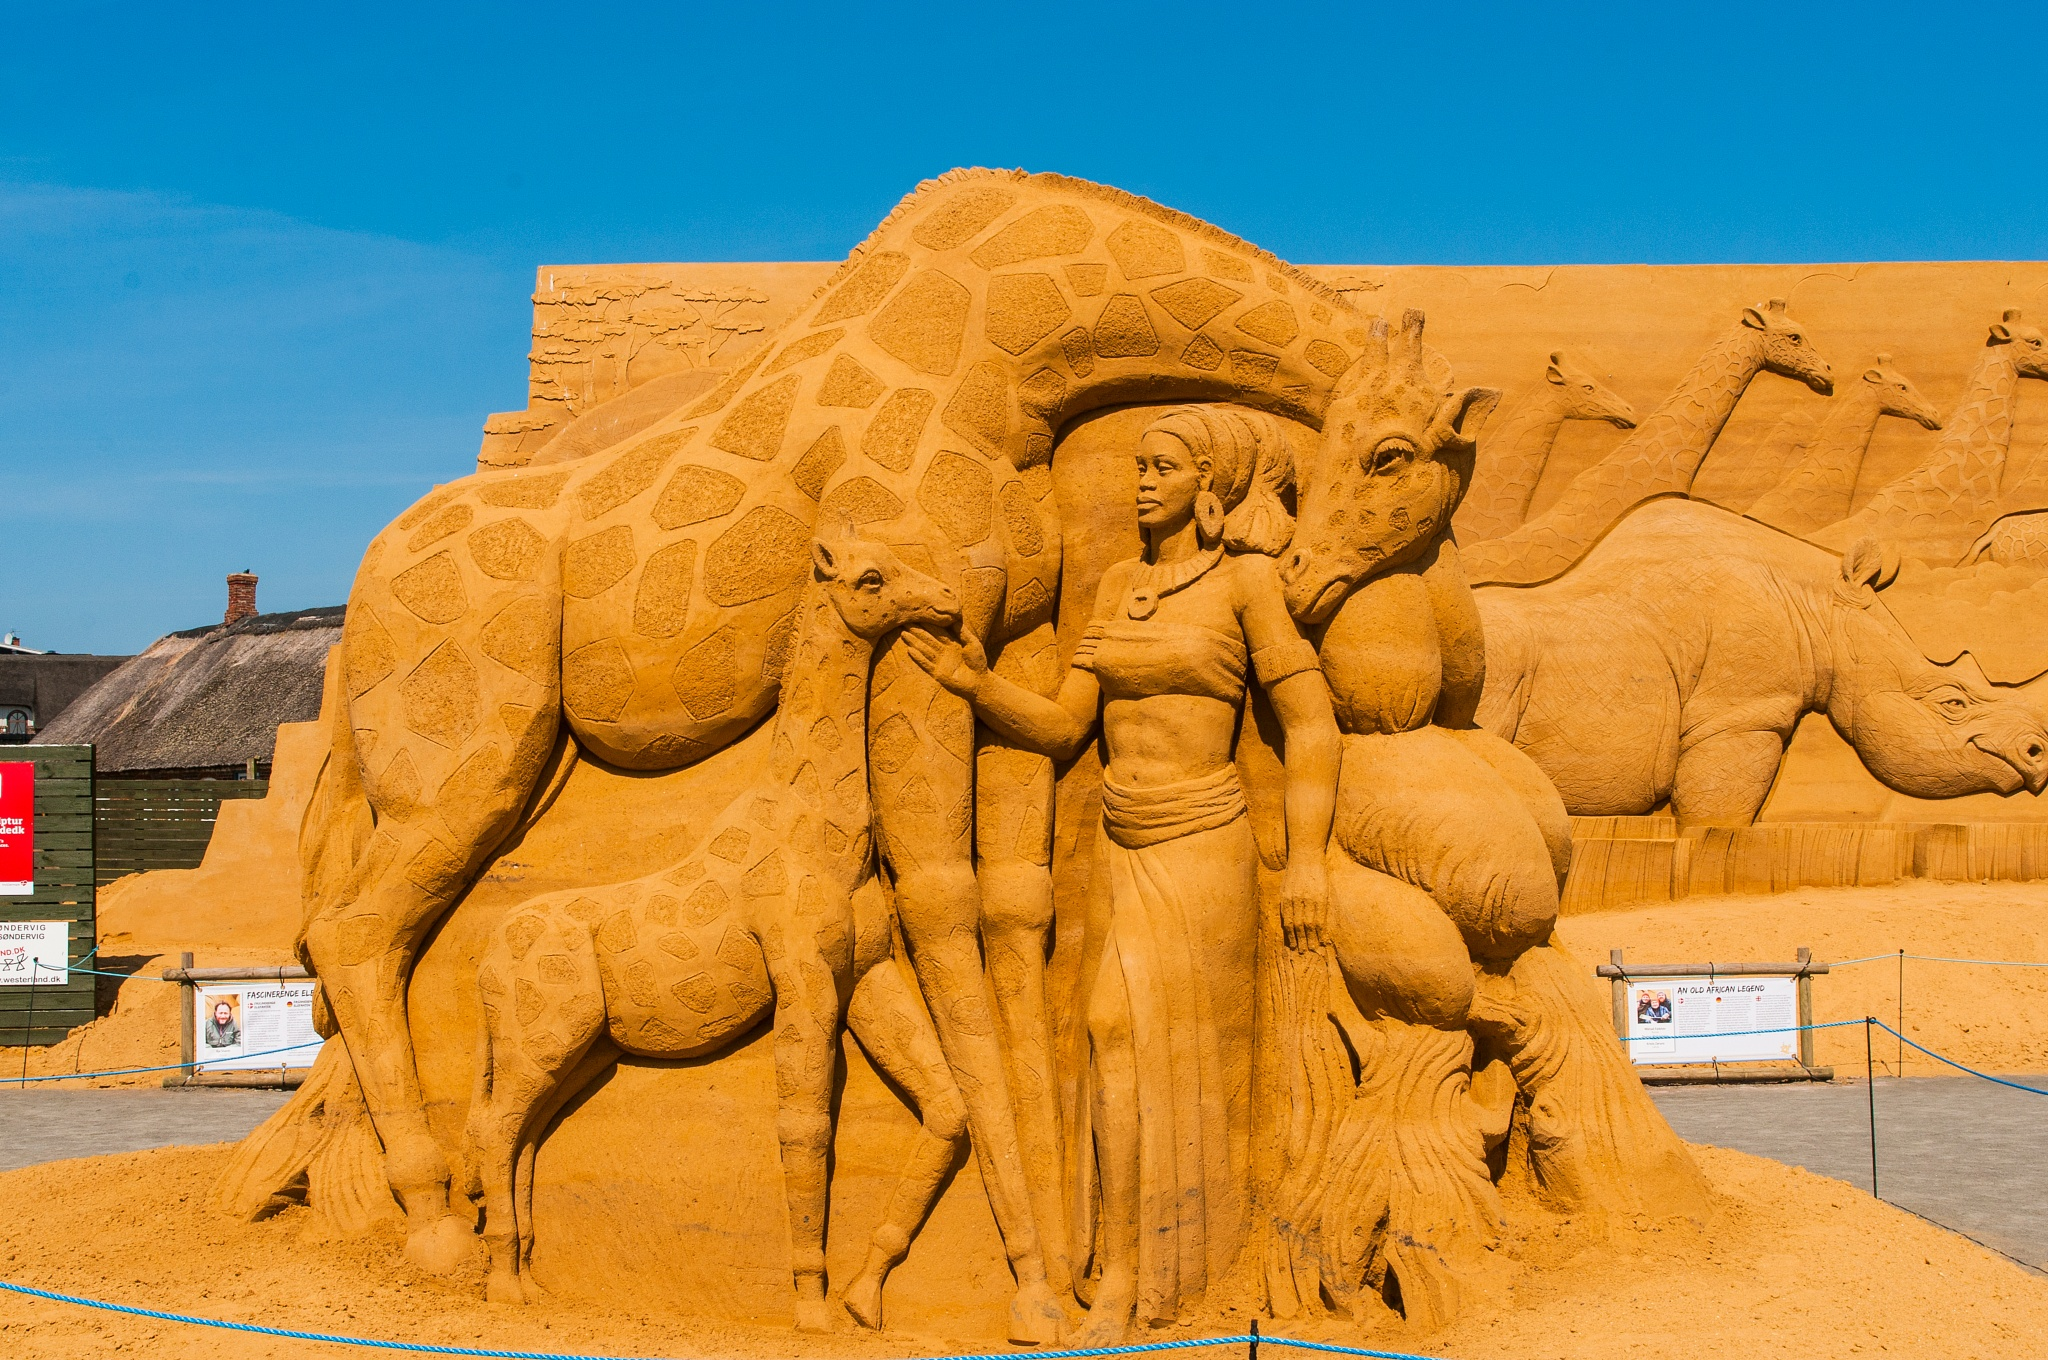 The entire sculpture... by Steen Skov